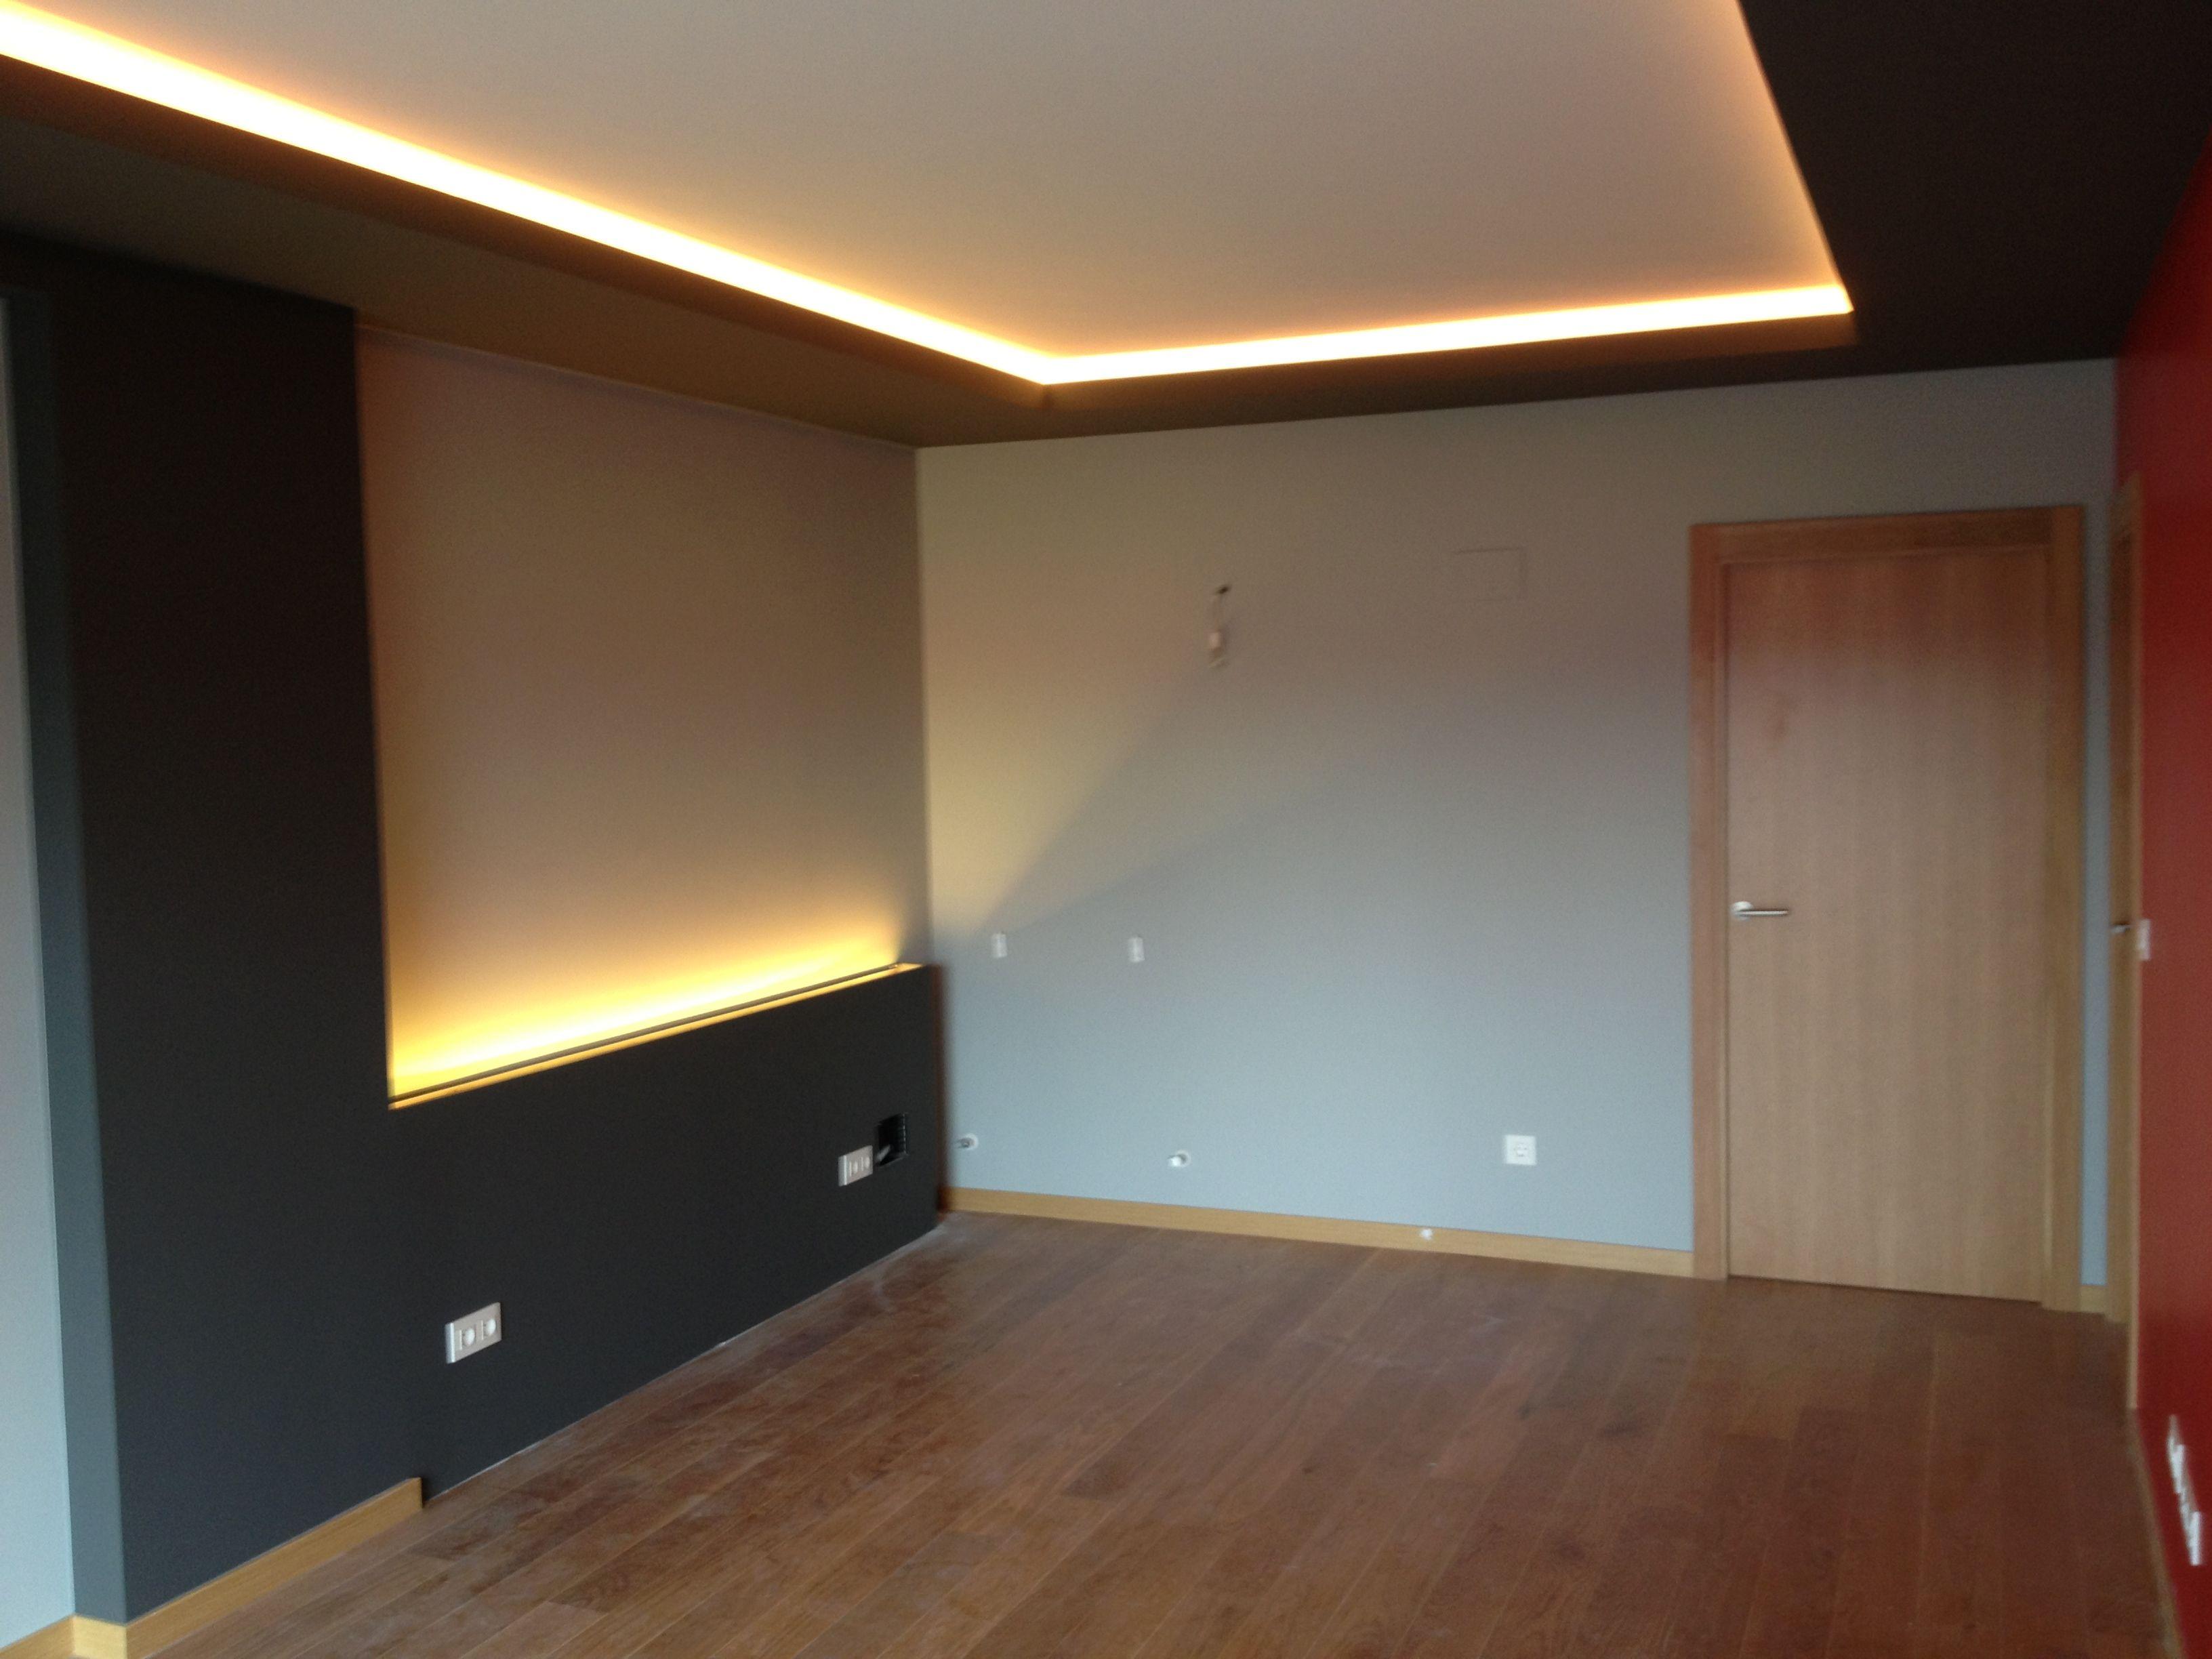 iluminacin tiras de led   decoracin del hogar